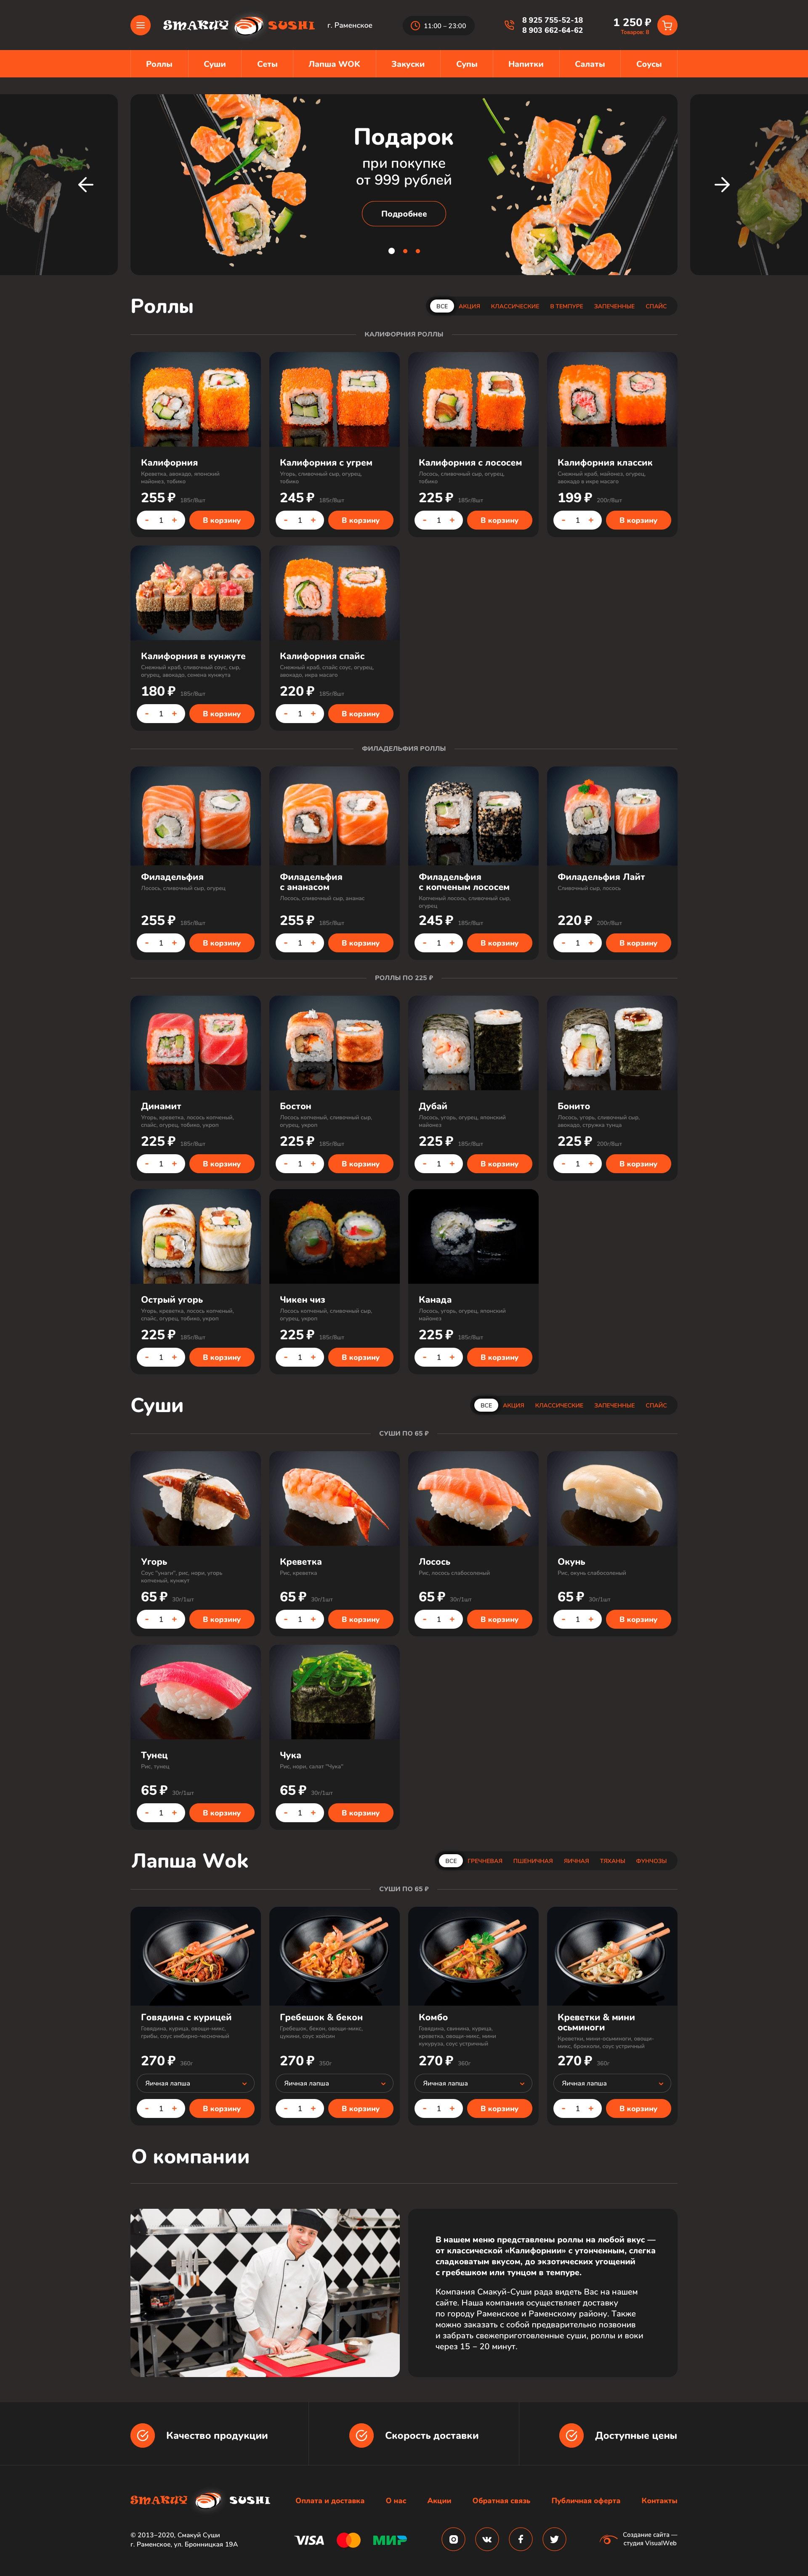 Создание интернет-магазина Smakuy Sushi